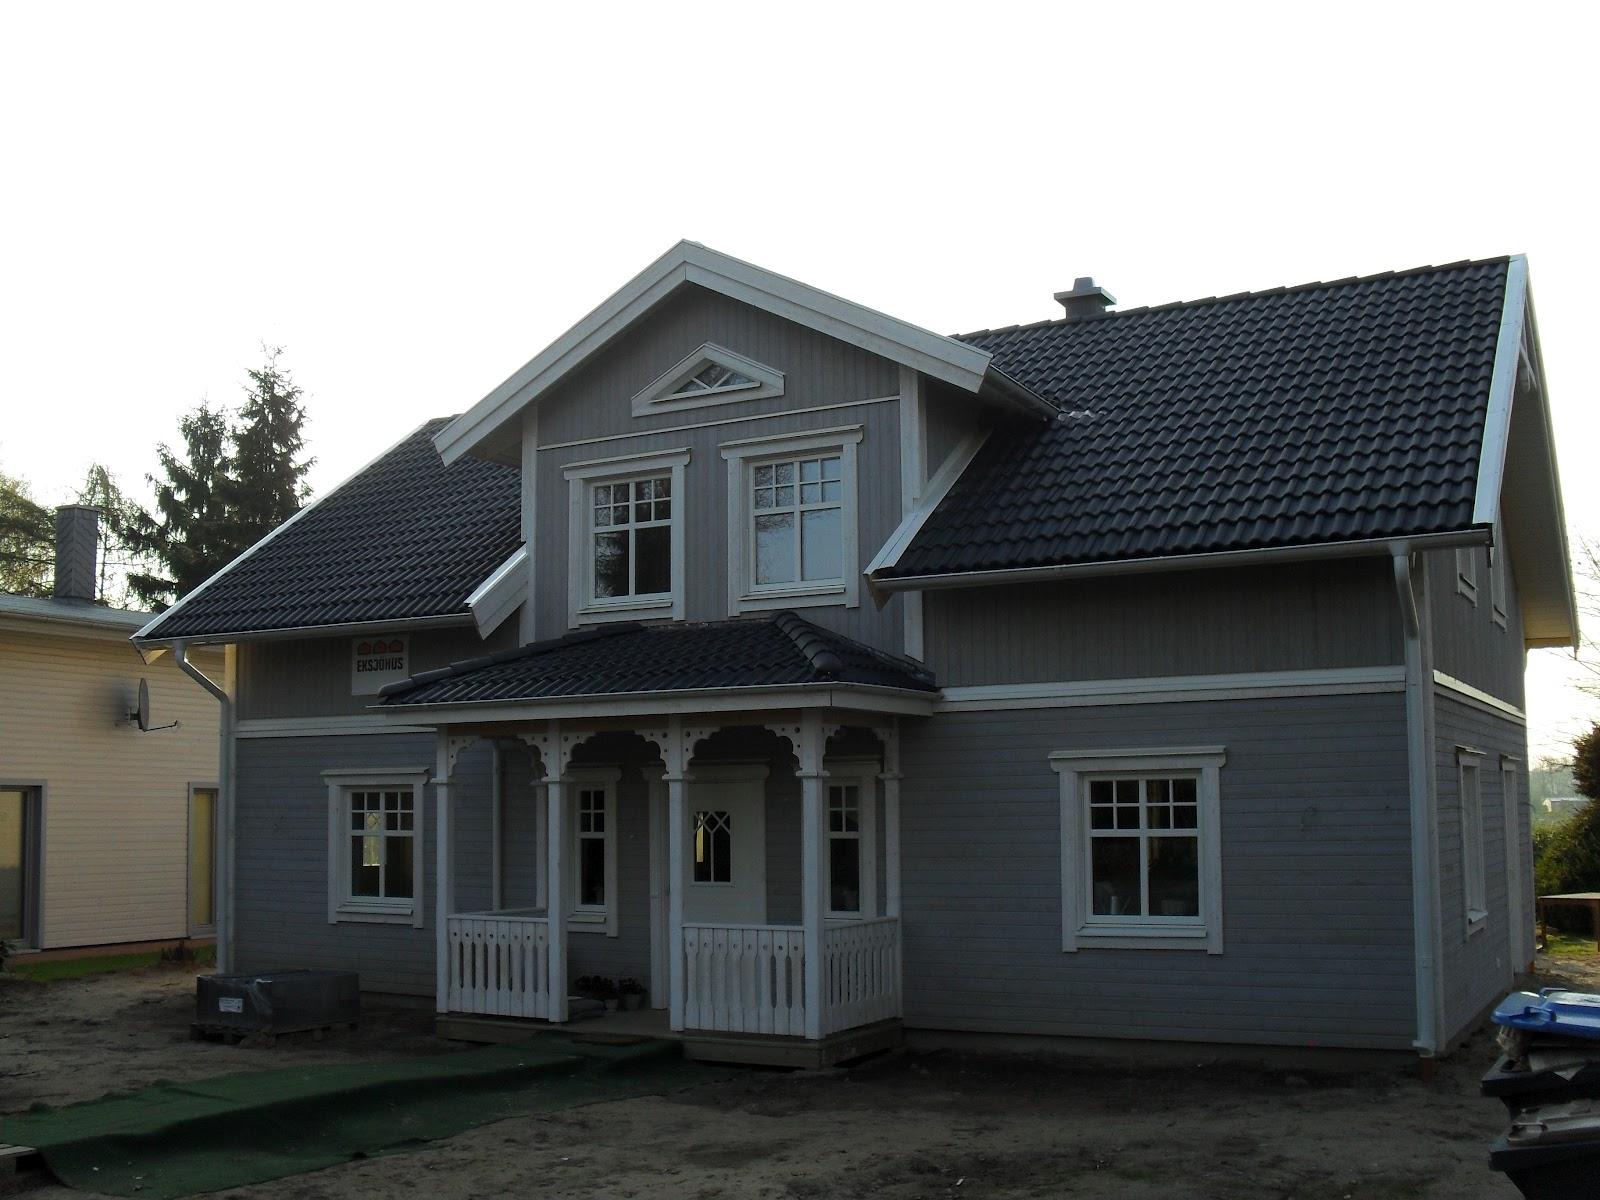 Hausfassade Farbe hausfassade farbe beispiele ideen